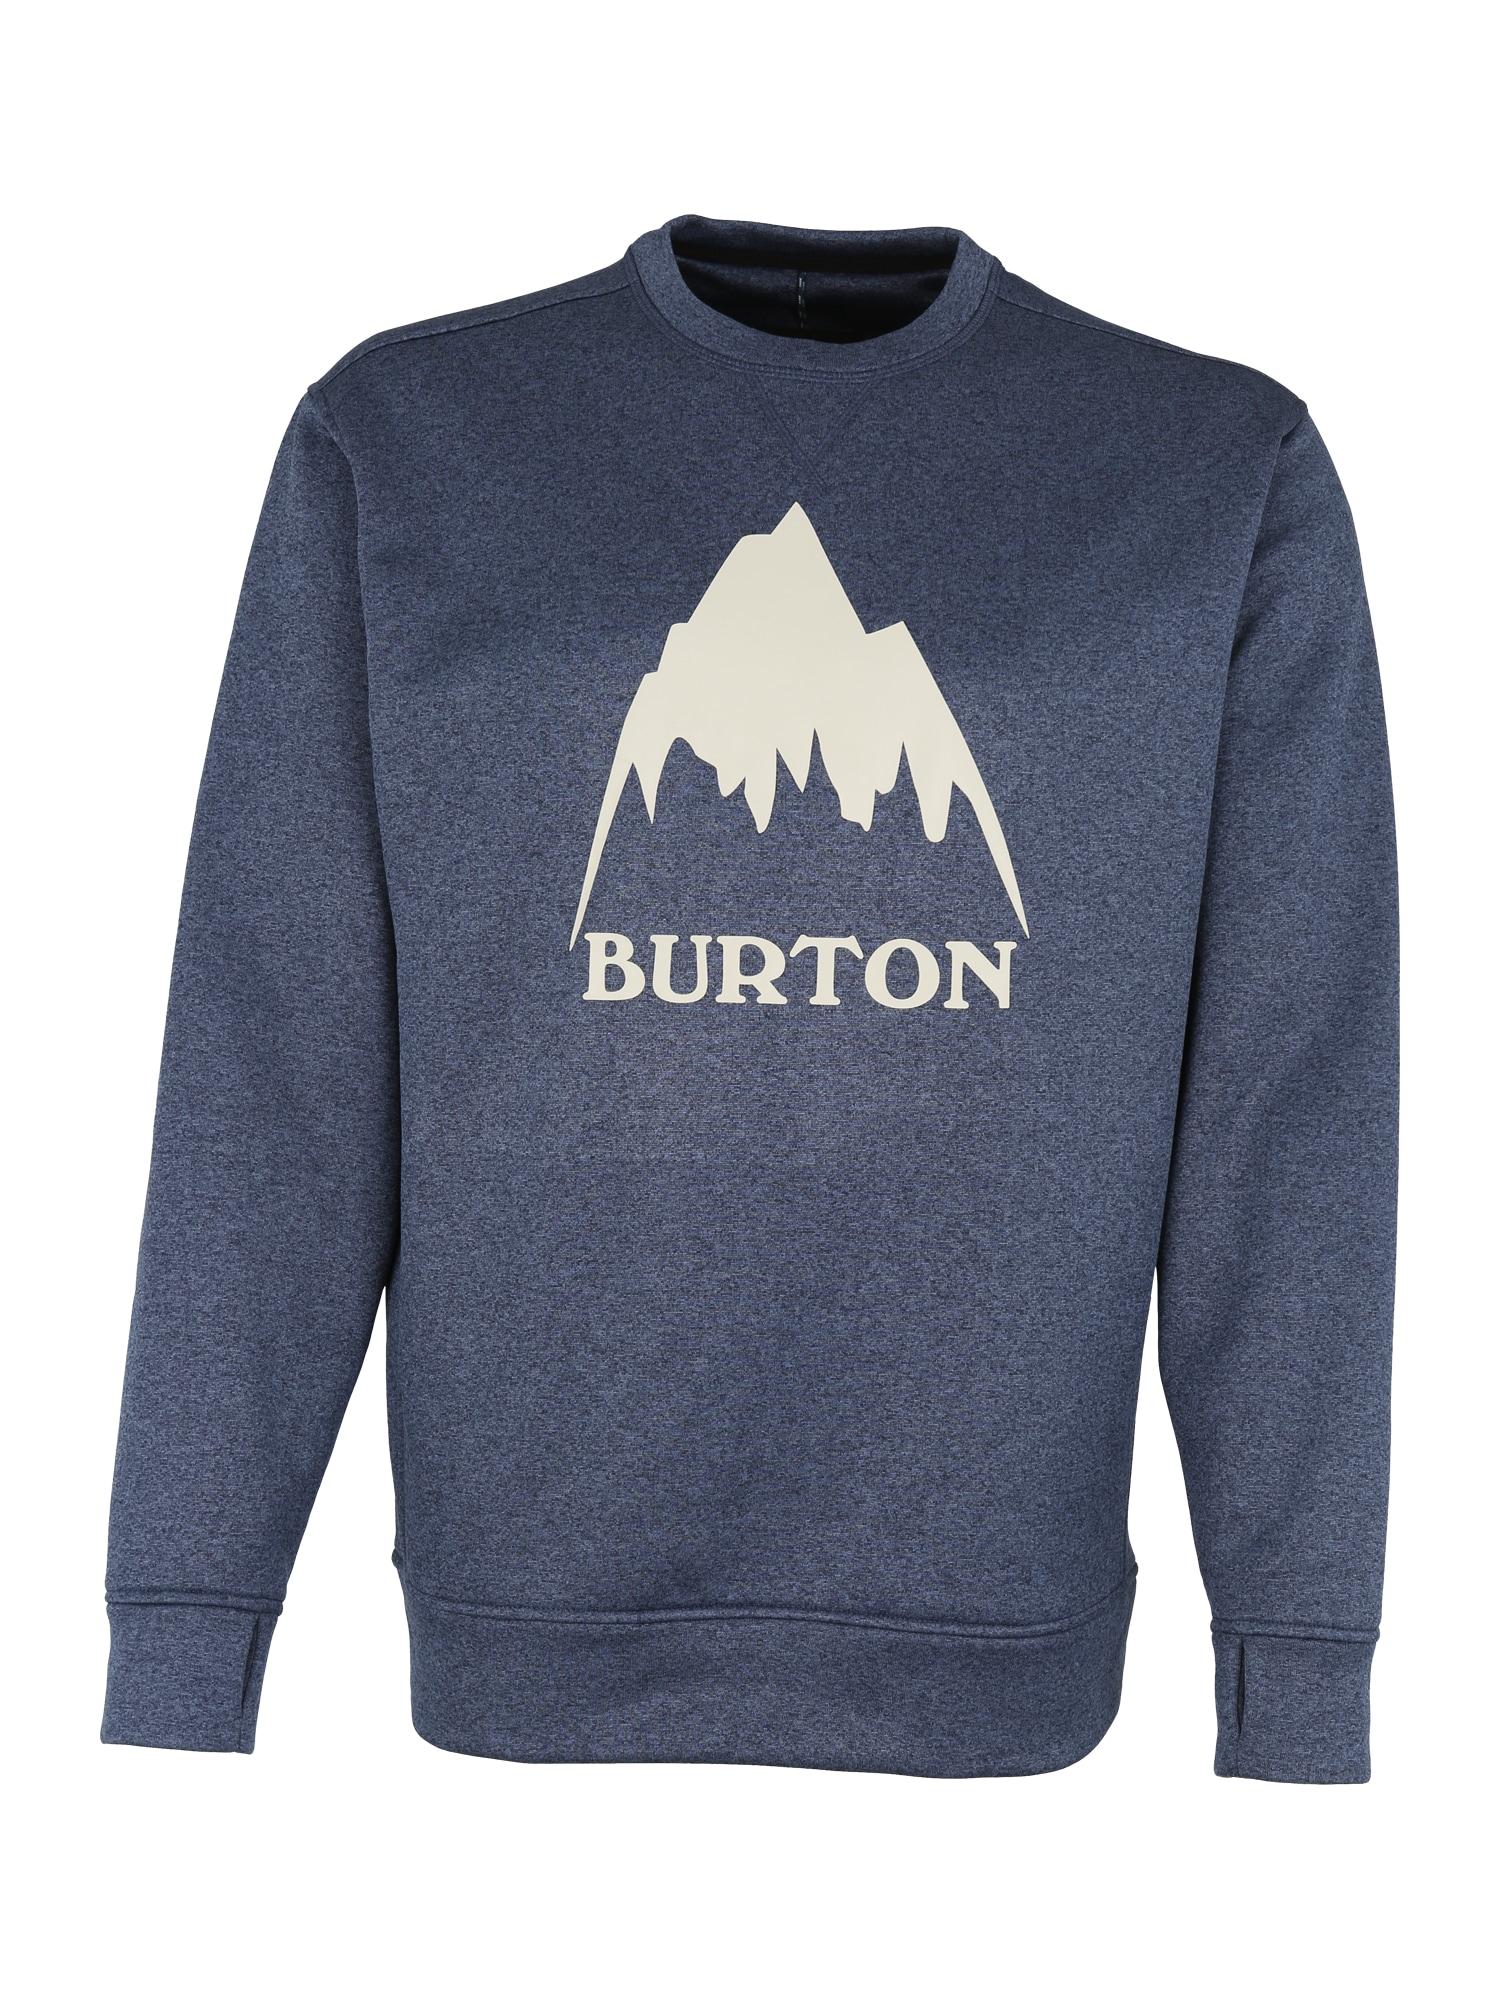 Sportovní svetr Oak tmavě modrá bílá BURTON